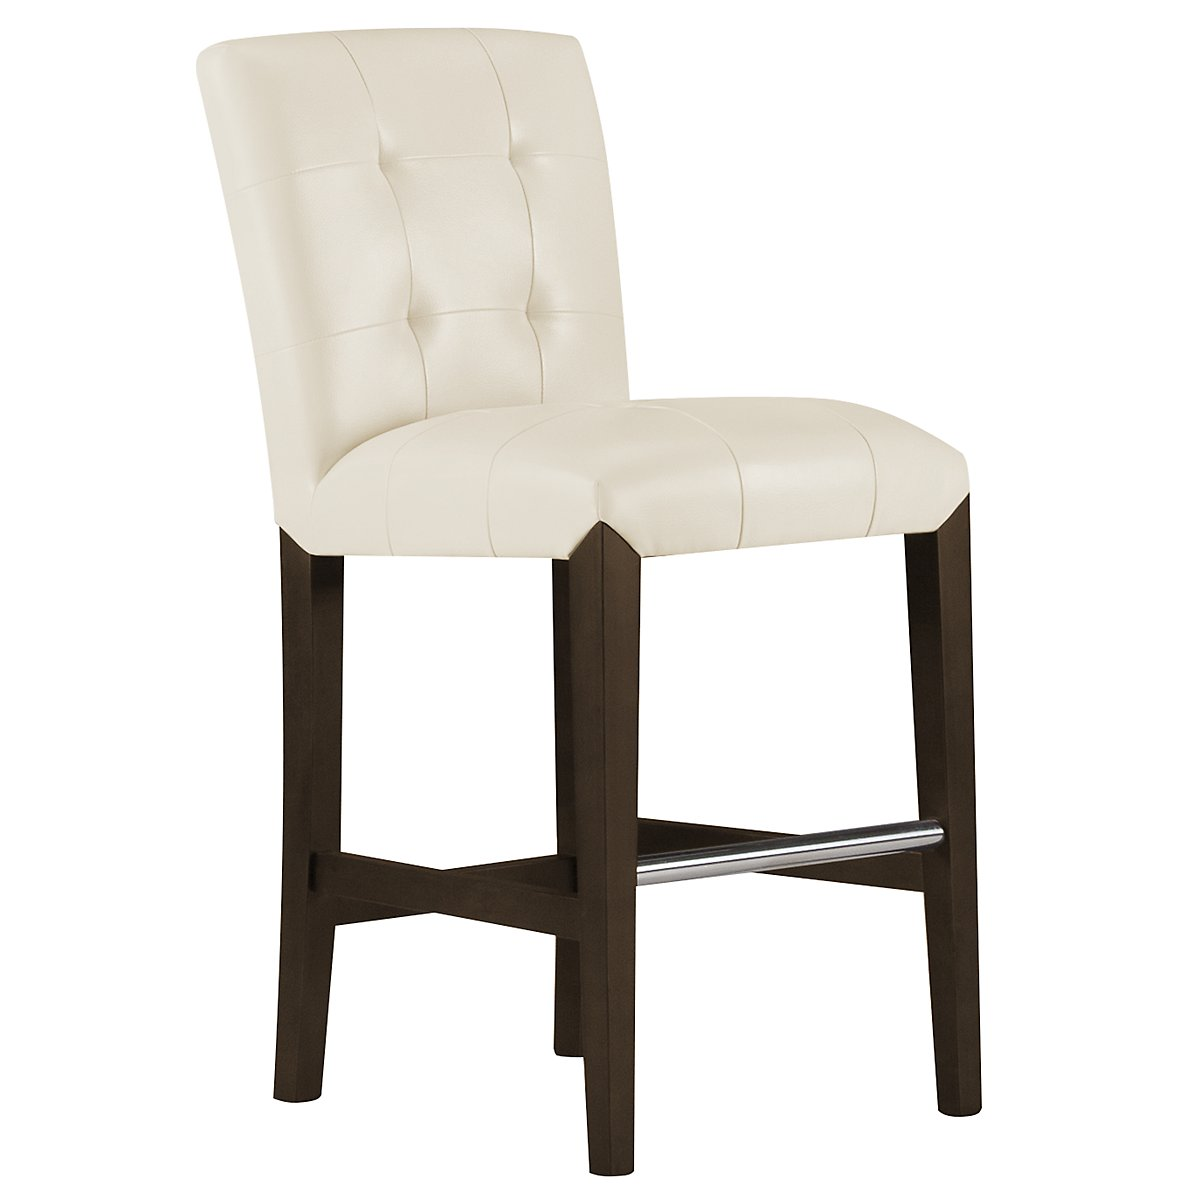 "Trisha2 Light Beige Bonded Leather 24"" Upholstered Barstool"